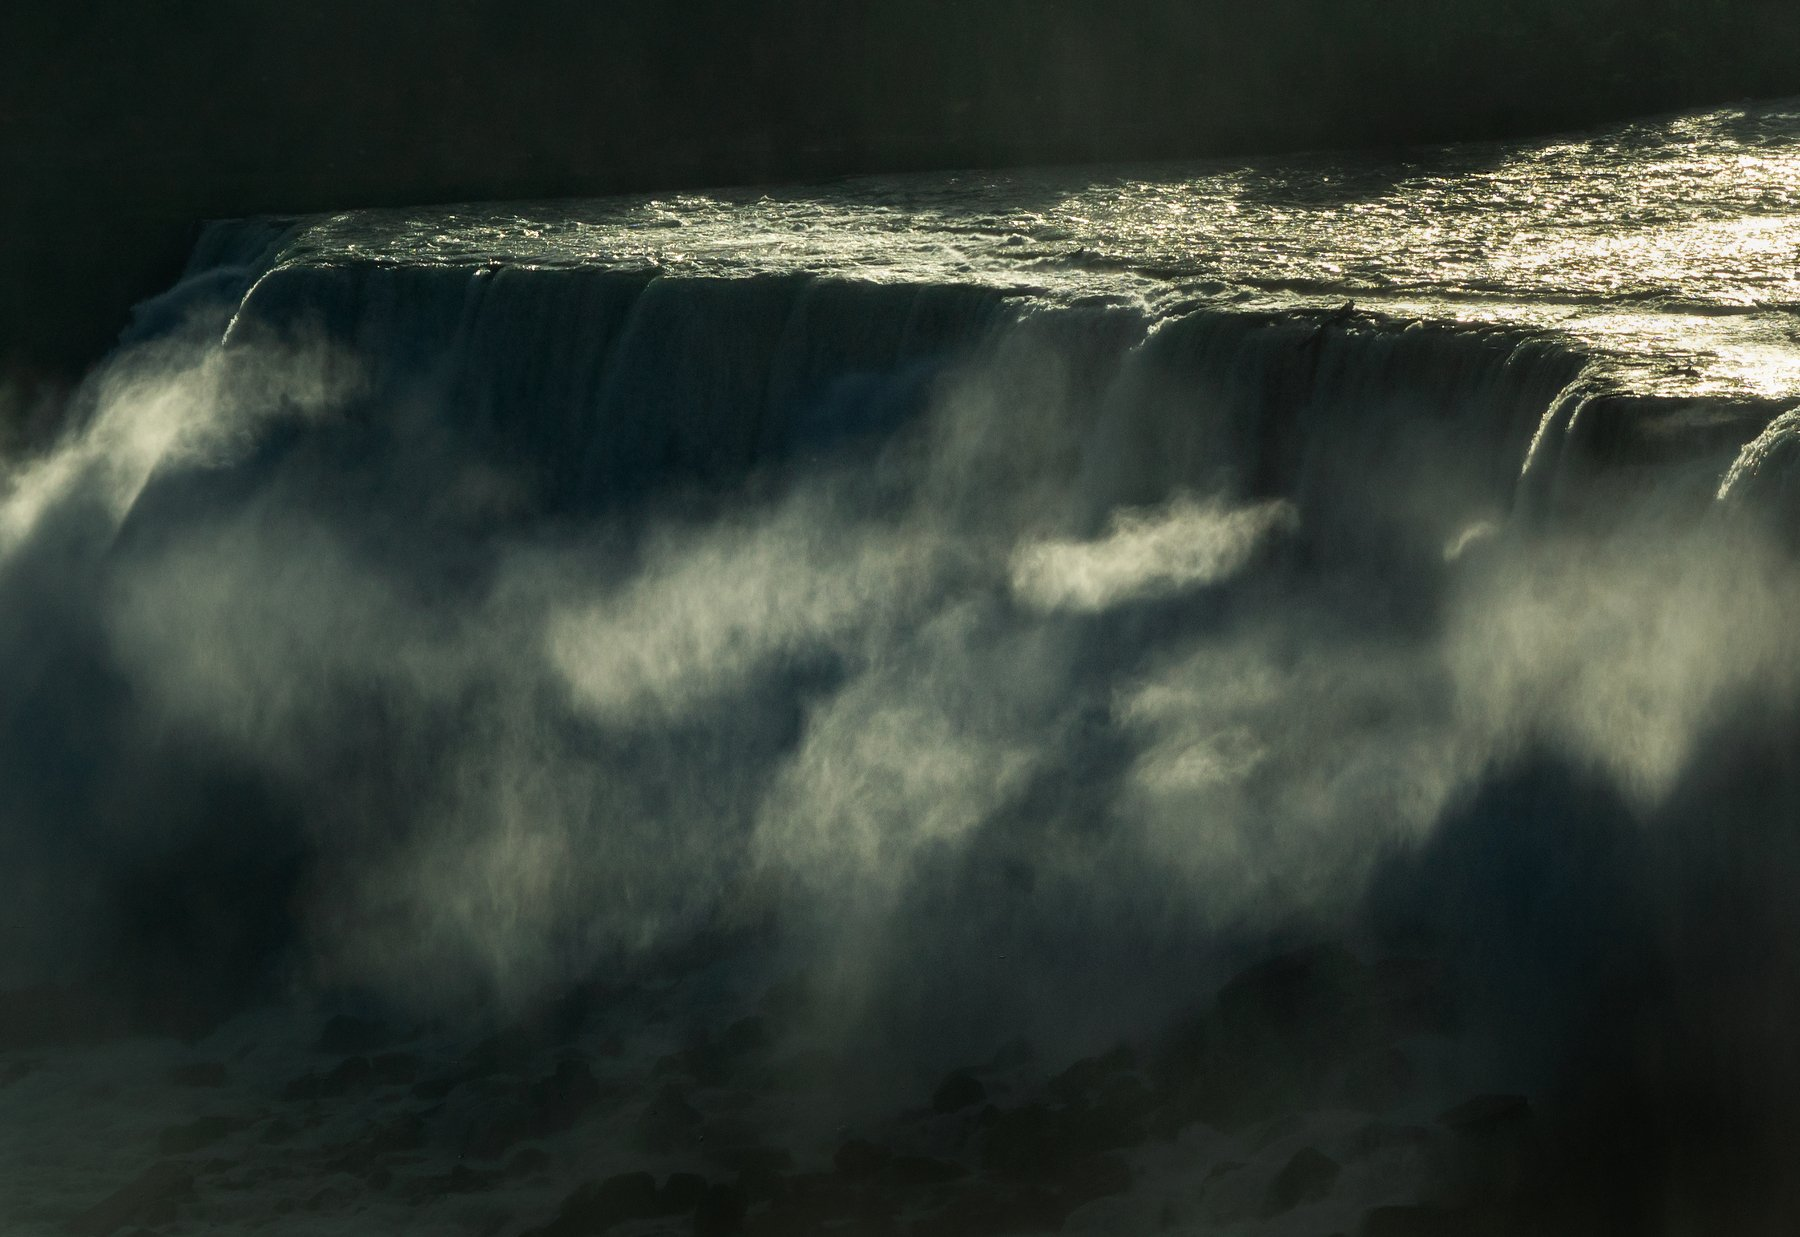 niagara falls, awakening, morning,ниагарский водопад, пробуждение, утро, G A S